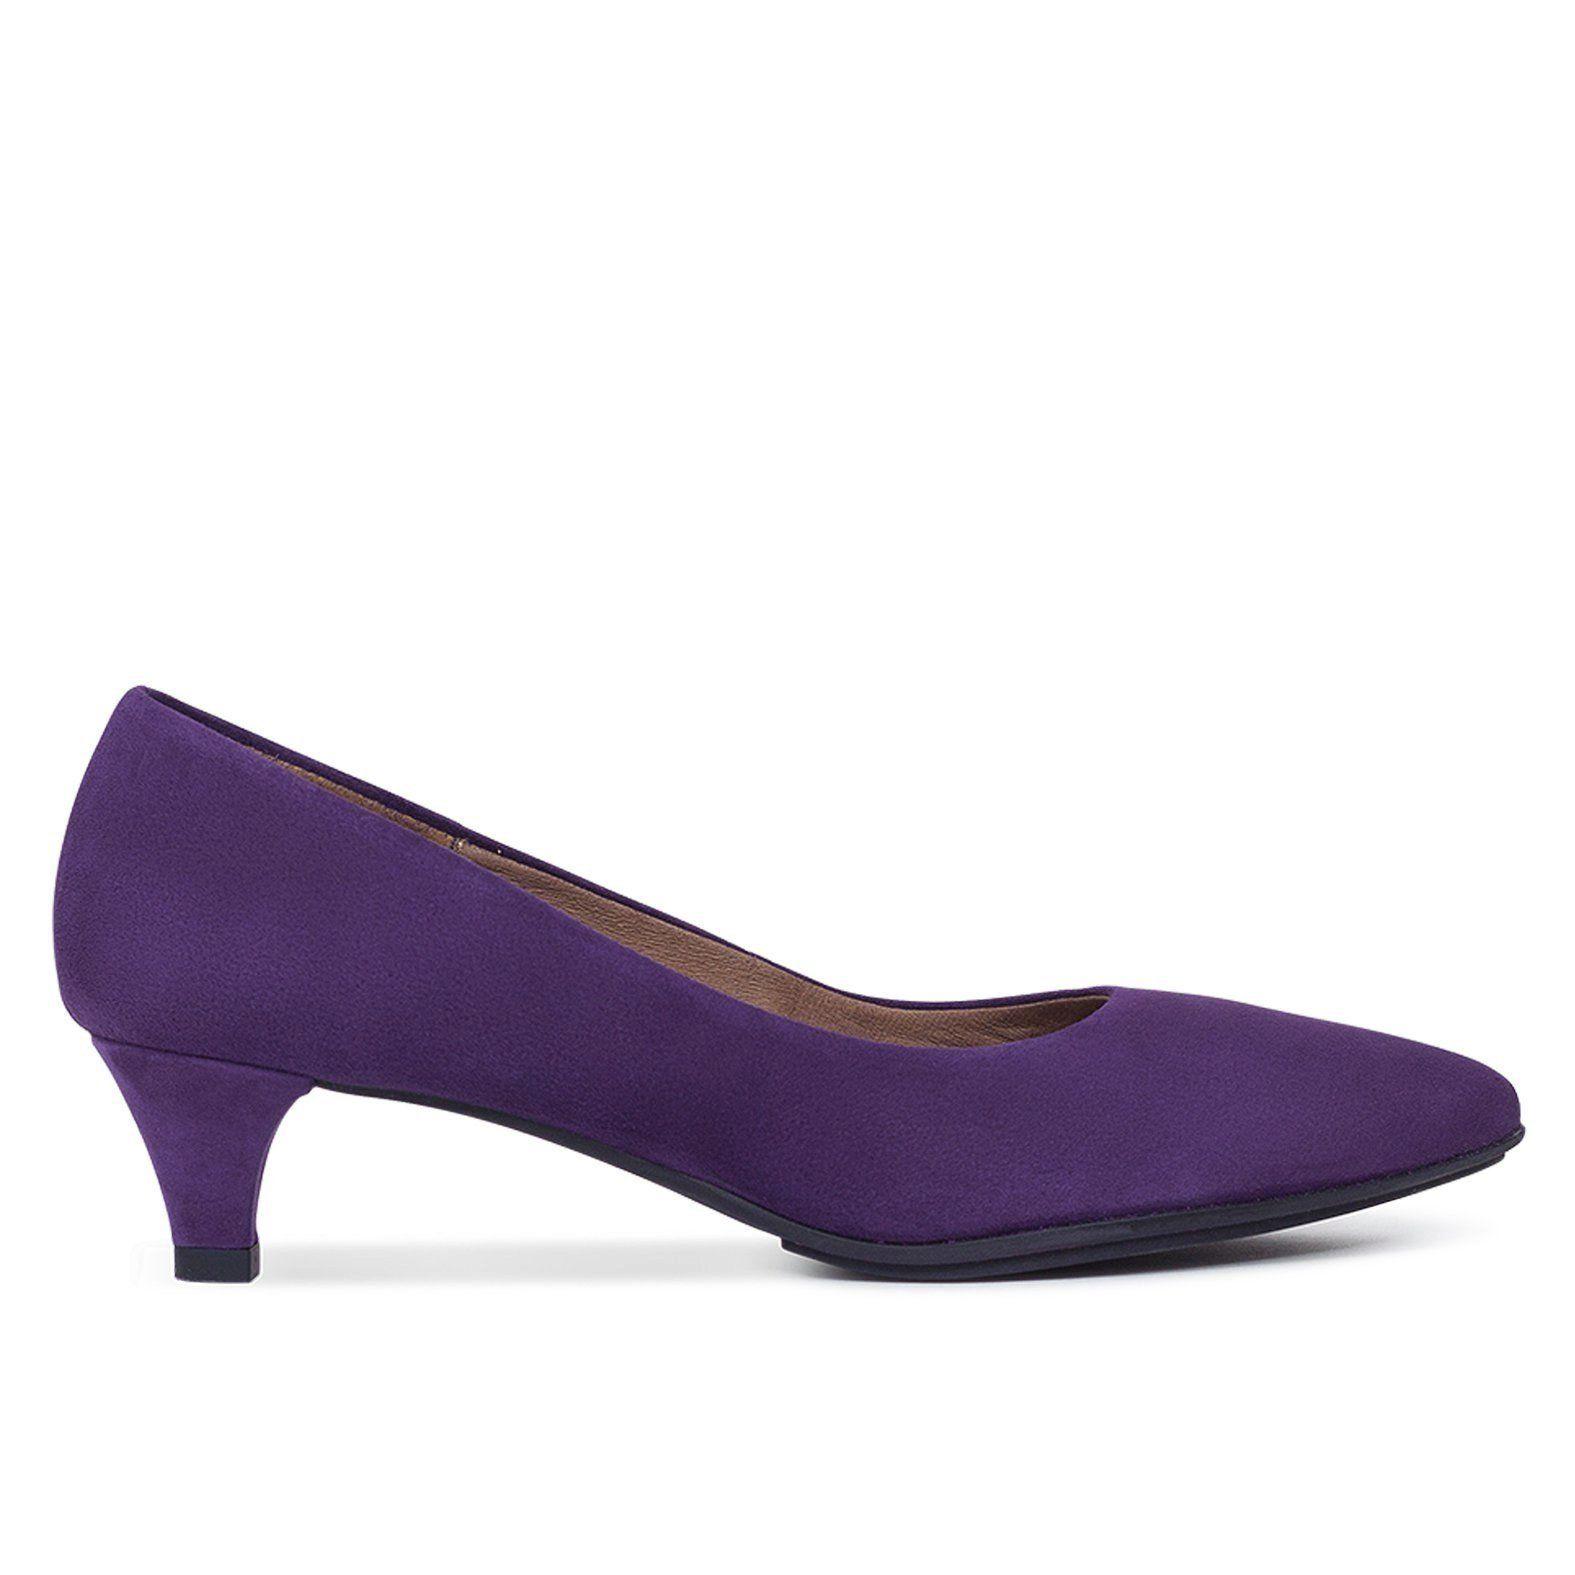 URBAN KITTEN Zapatos de mujer stilettos BERENJENA en 2020